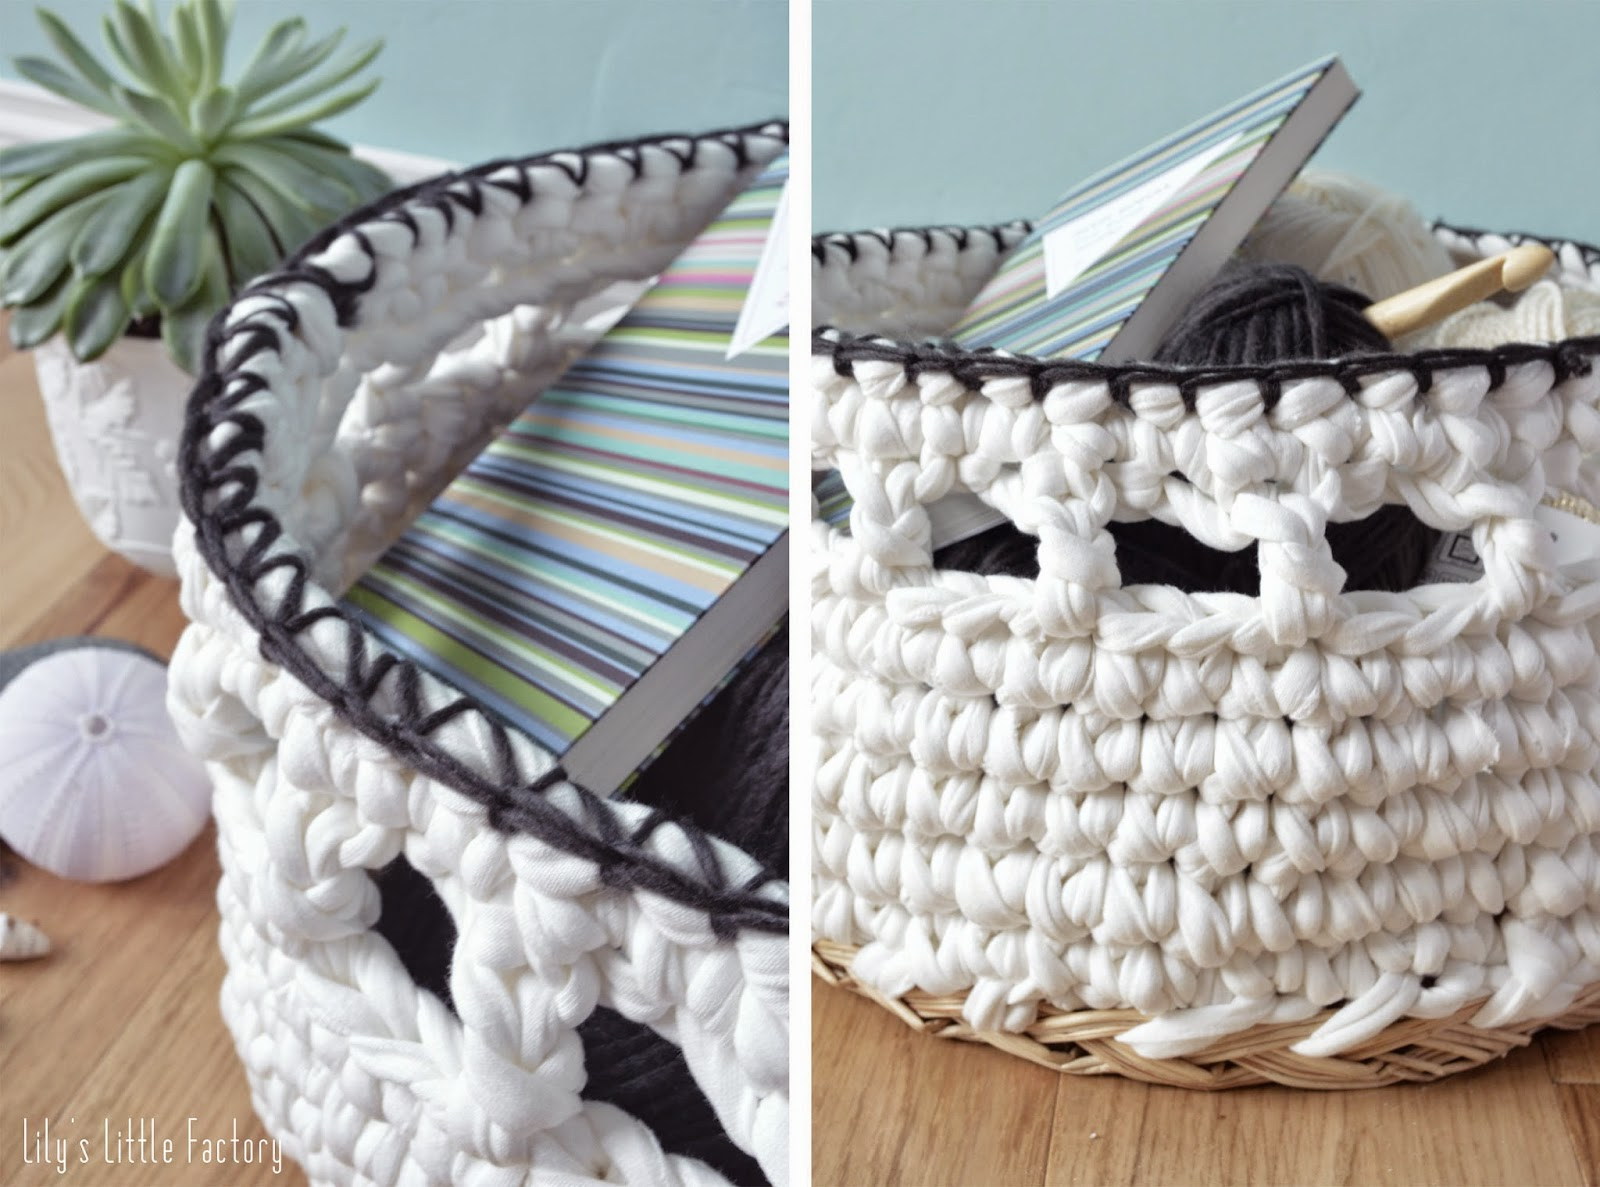 une pani re en trapilho et osier r cup 39 lily 39 s little factory blog diy bretagne. Black Bedroom Furniture Sets. Home Design Ideas